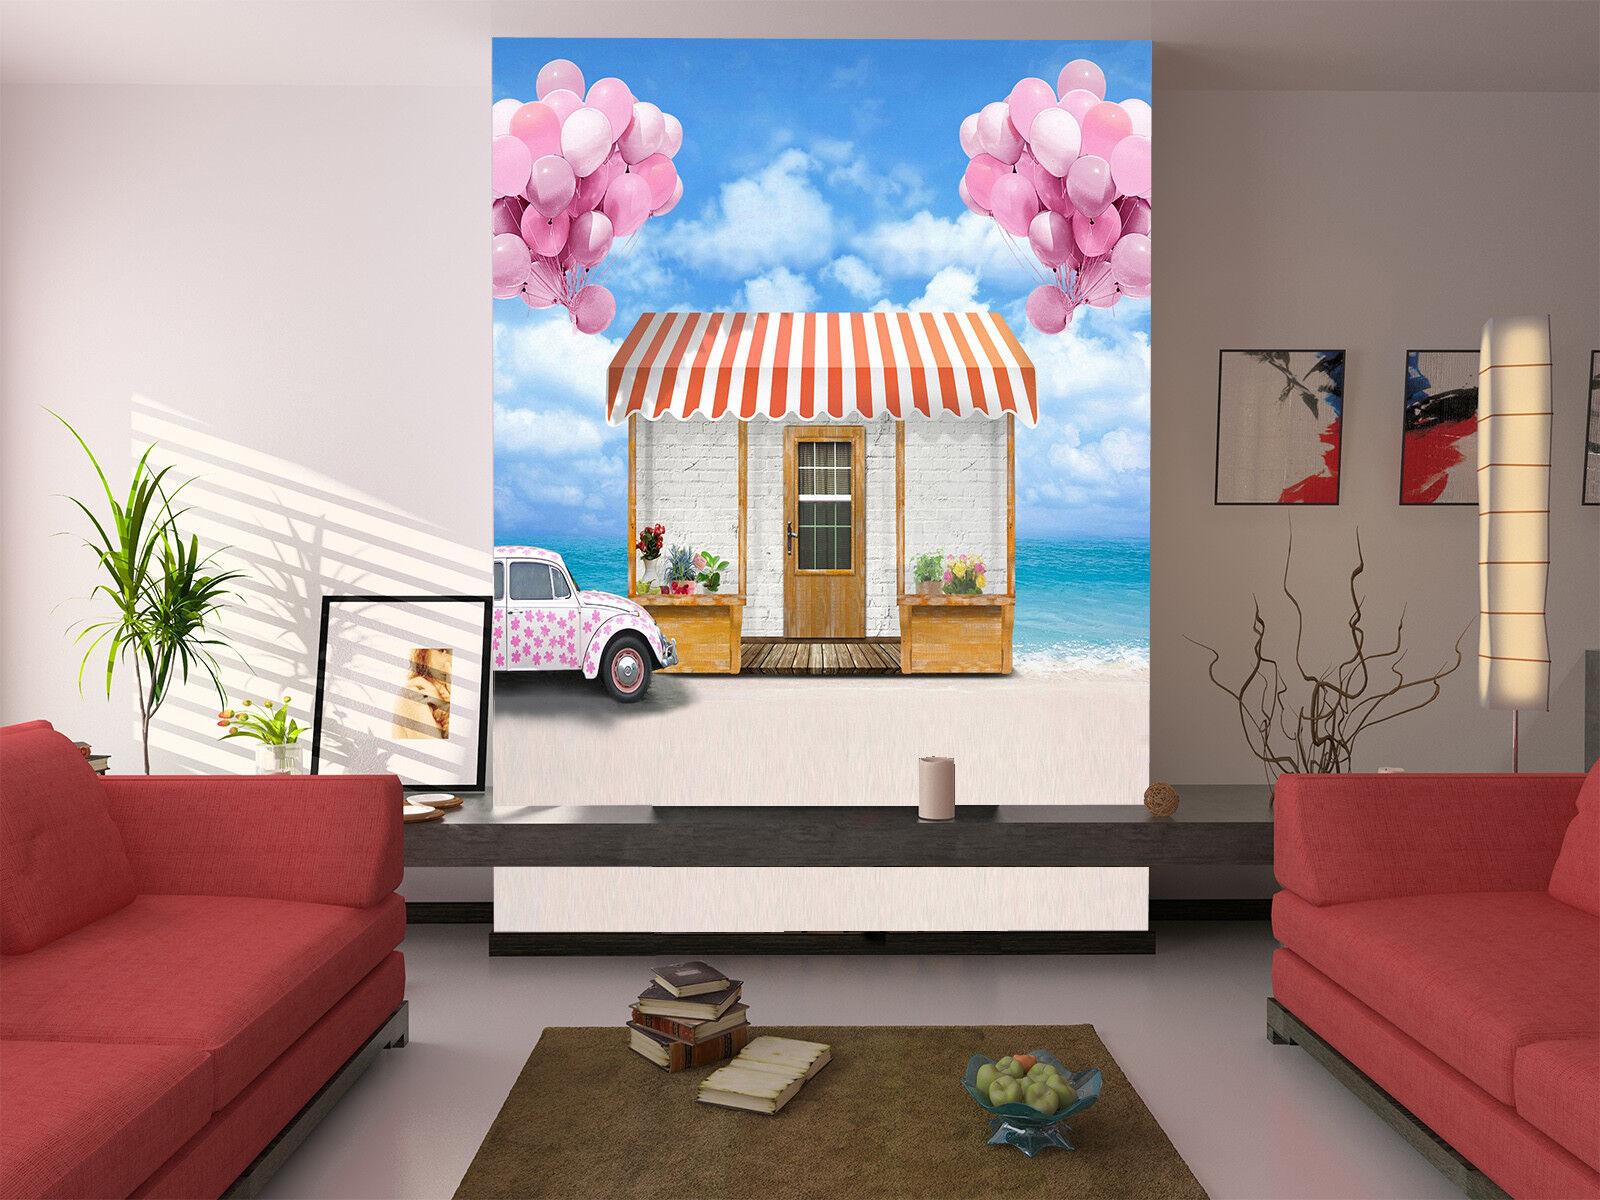 3D Balloons Hut Car 75 Wall Paper Murals Wall Print Wall Wallpaper Mural AU Kyra